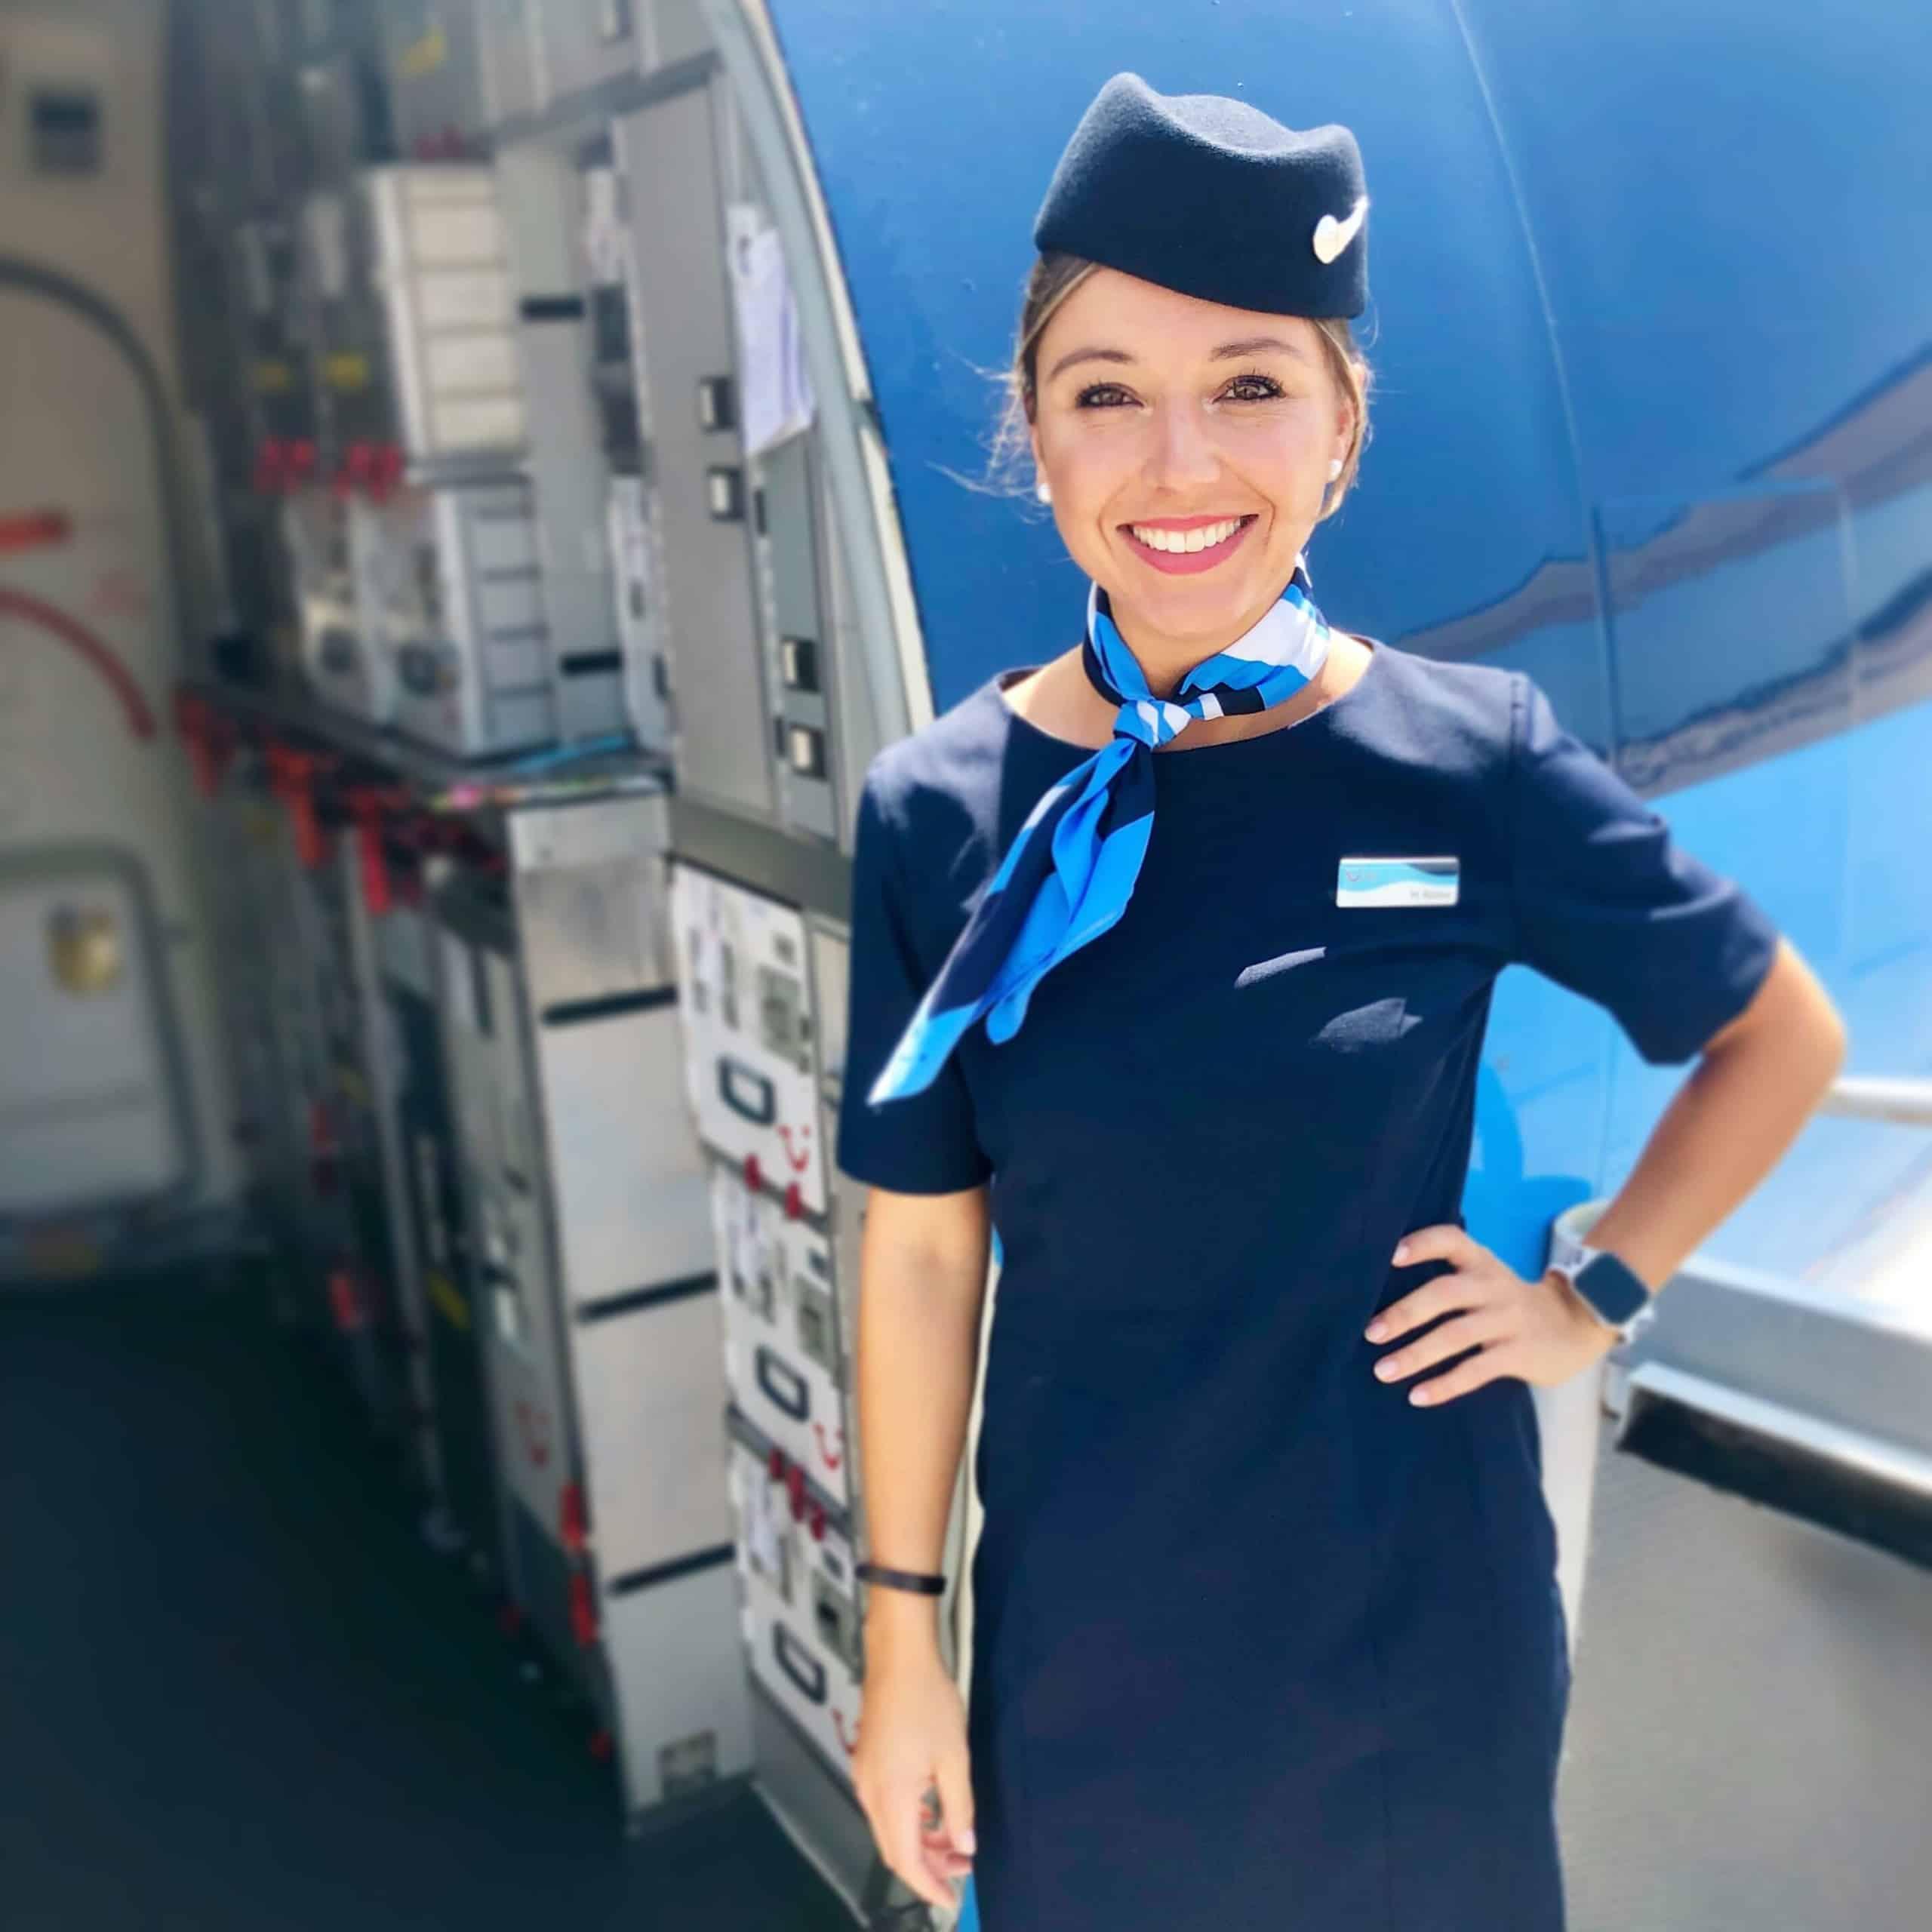 Marsha Flugbegleiterin Instagram-Profil @brekkielover